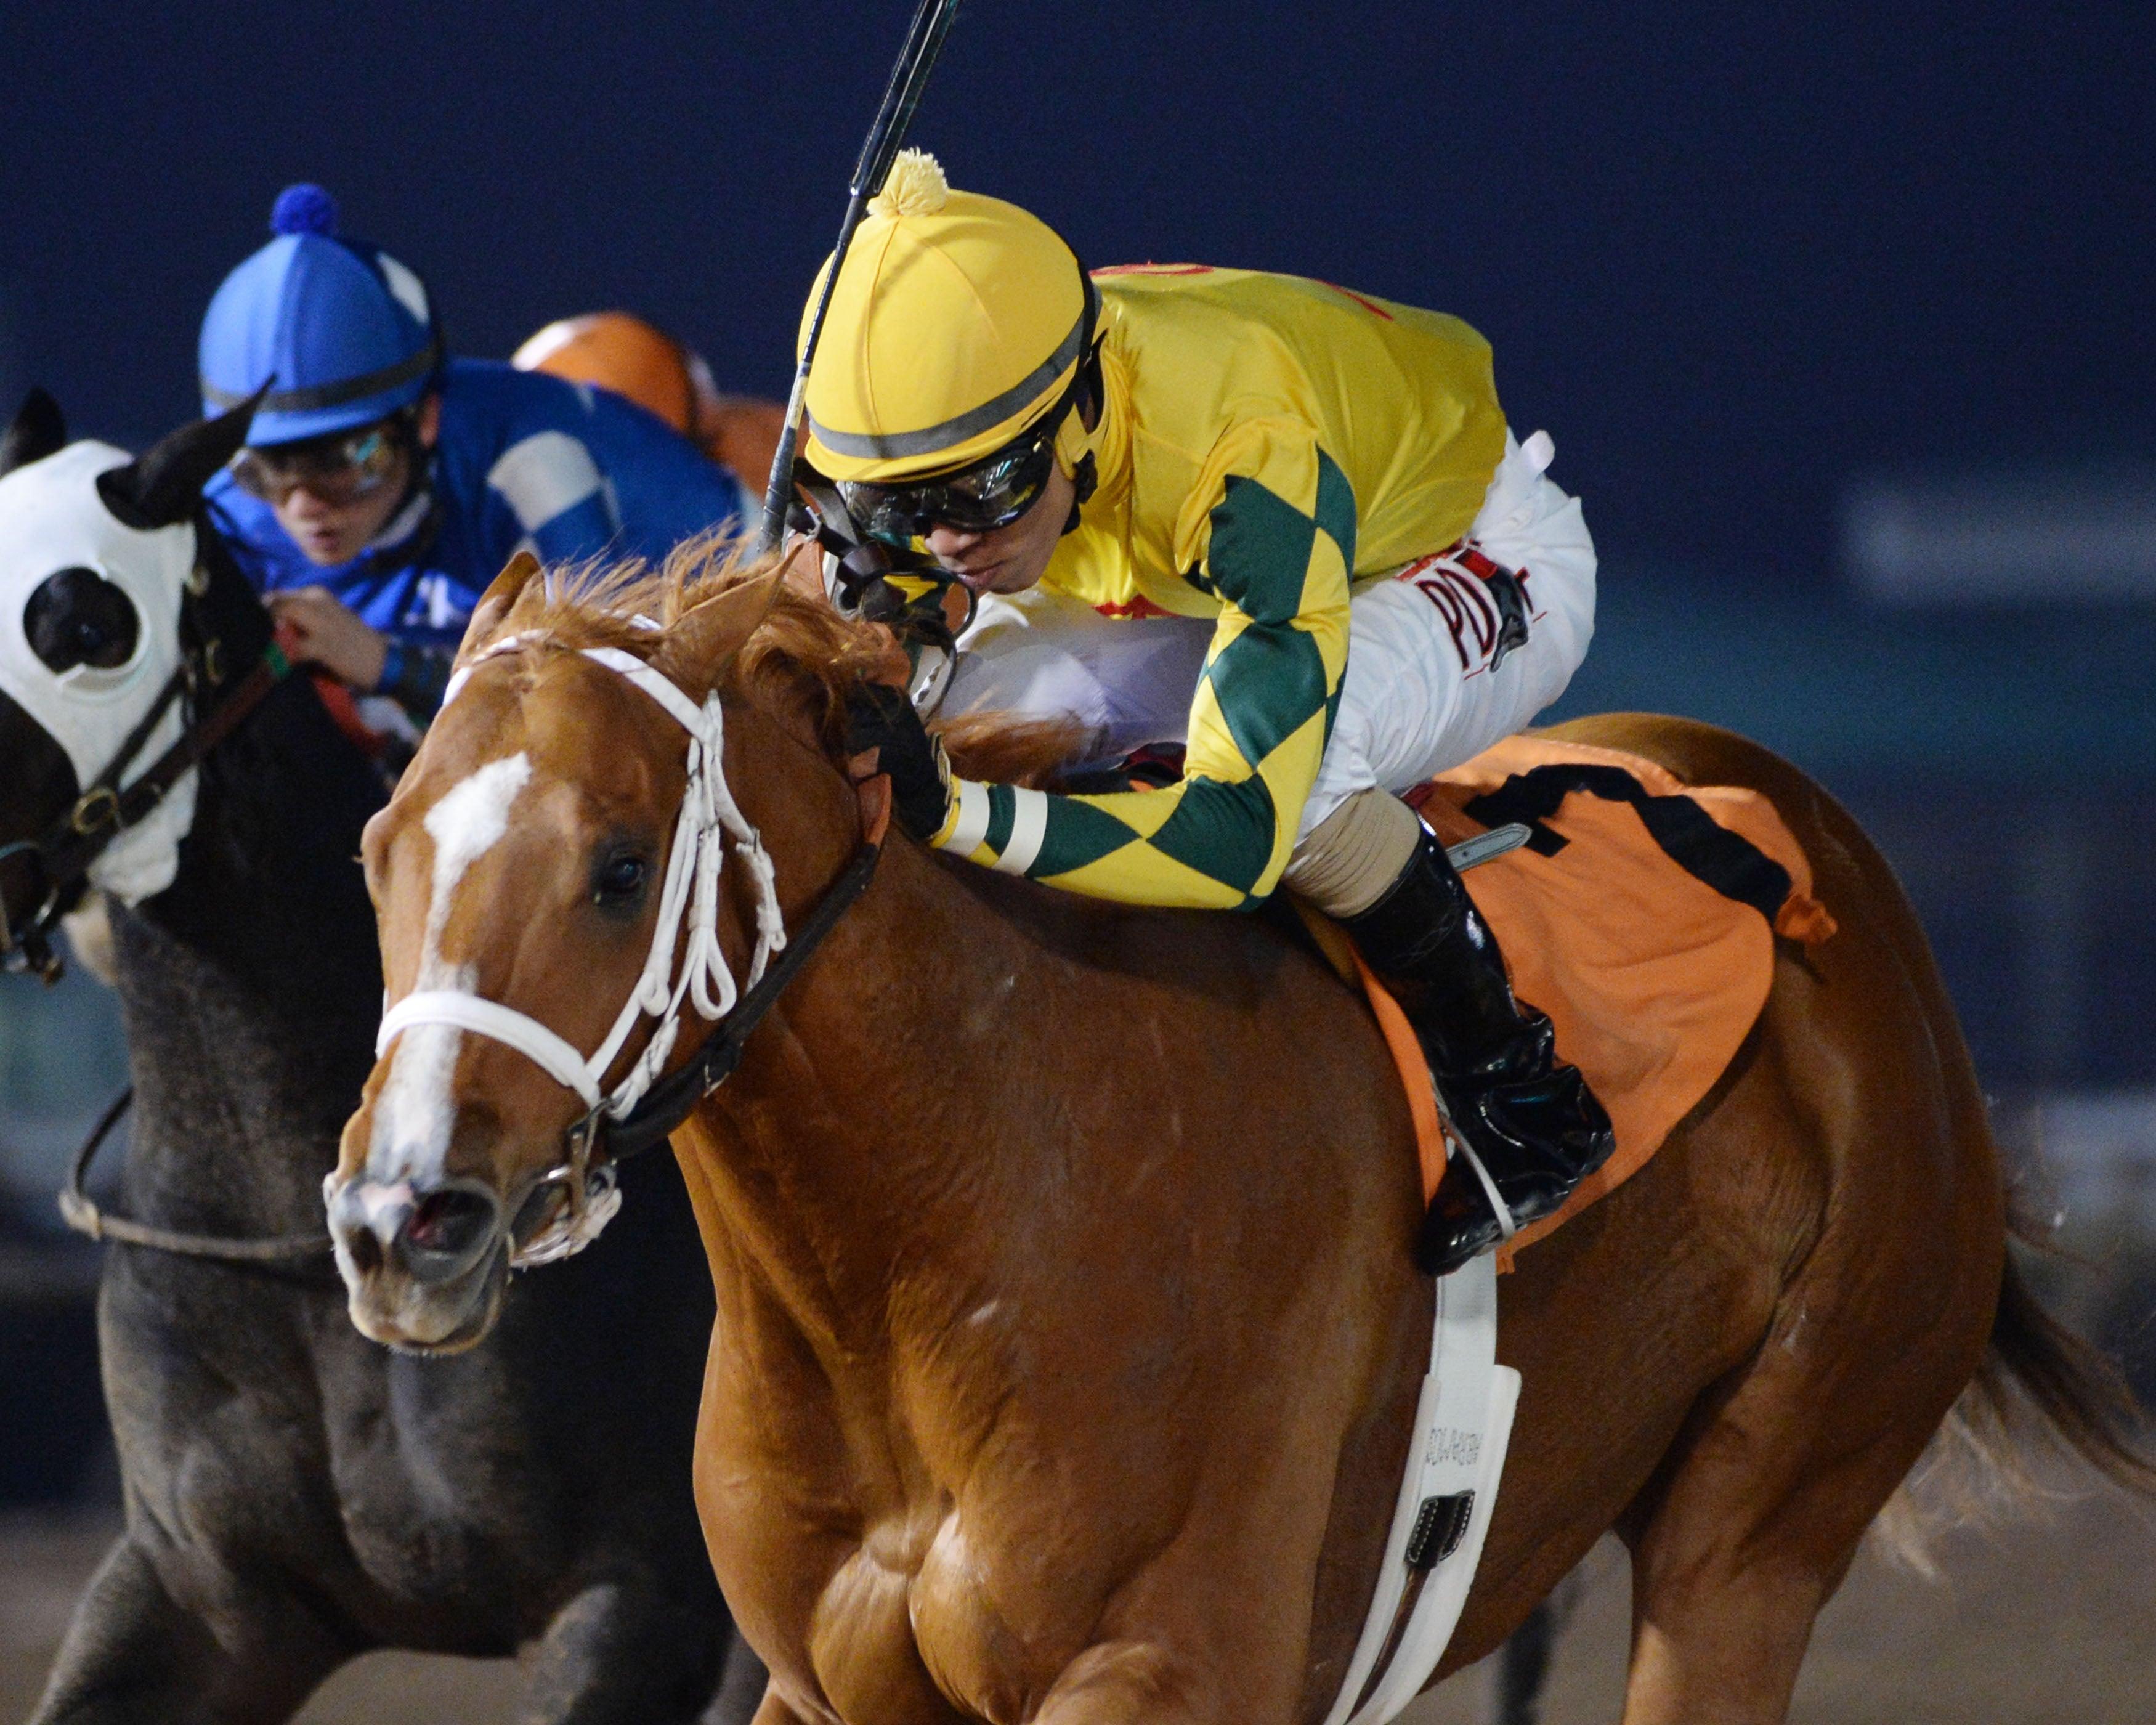 Bravura - The Groovy Stakes - 01-23-16 - R08 - HOU - Inside Finish.jpg